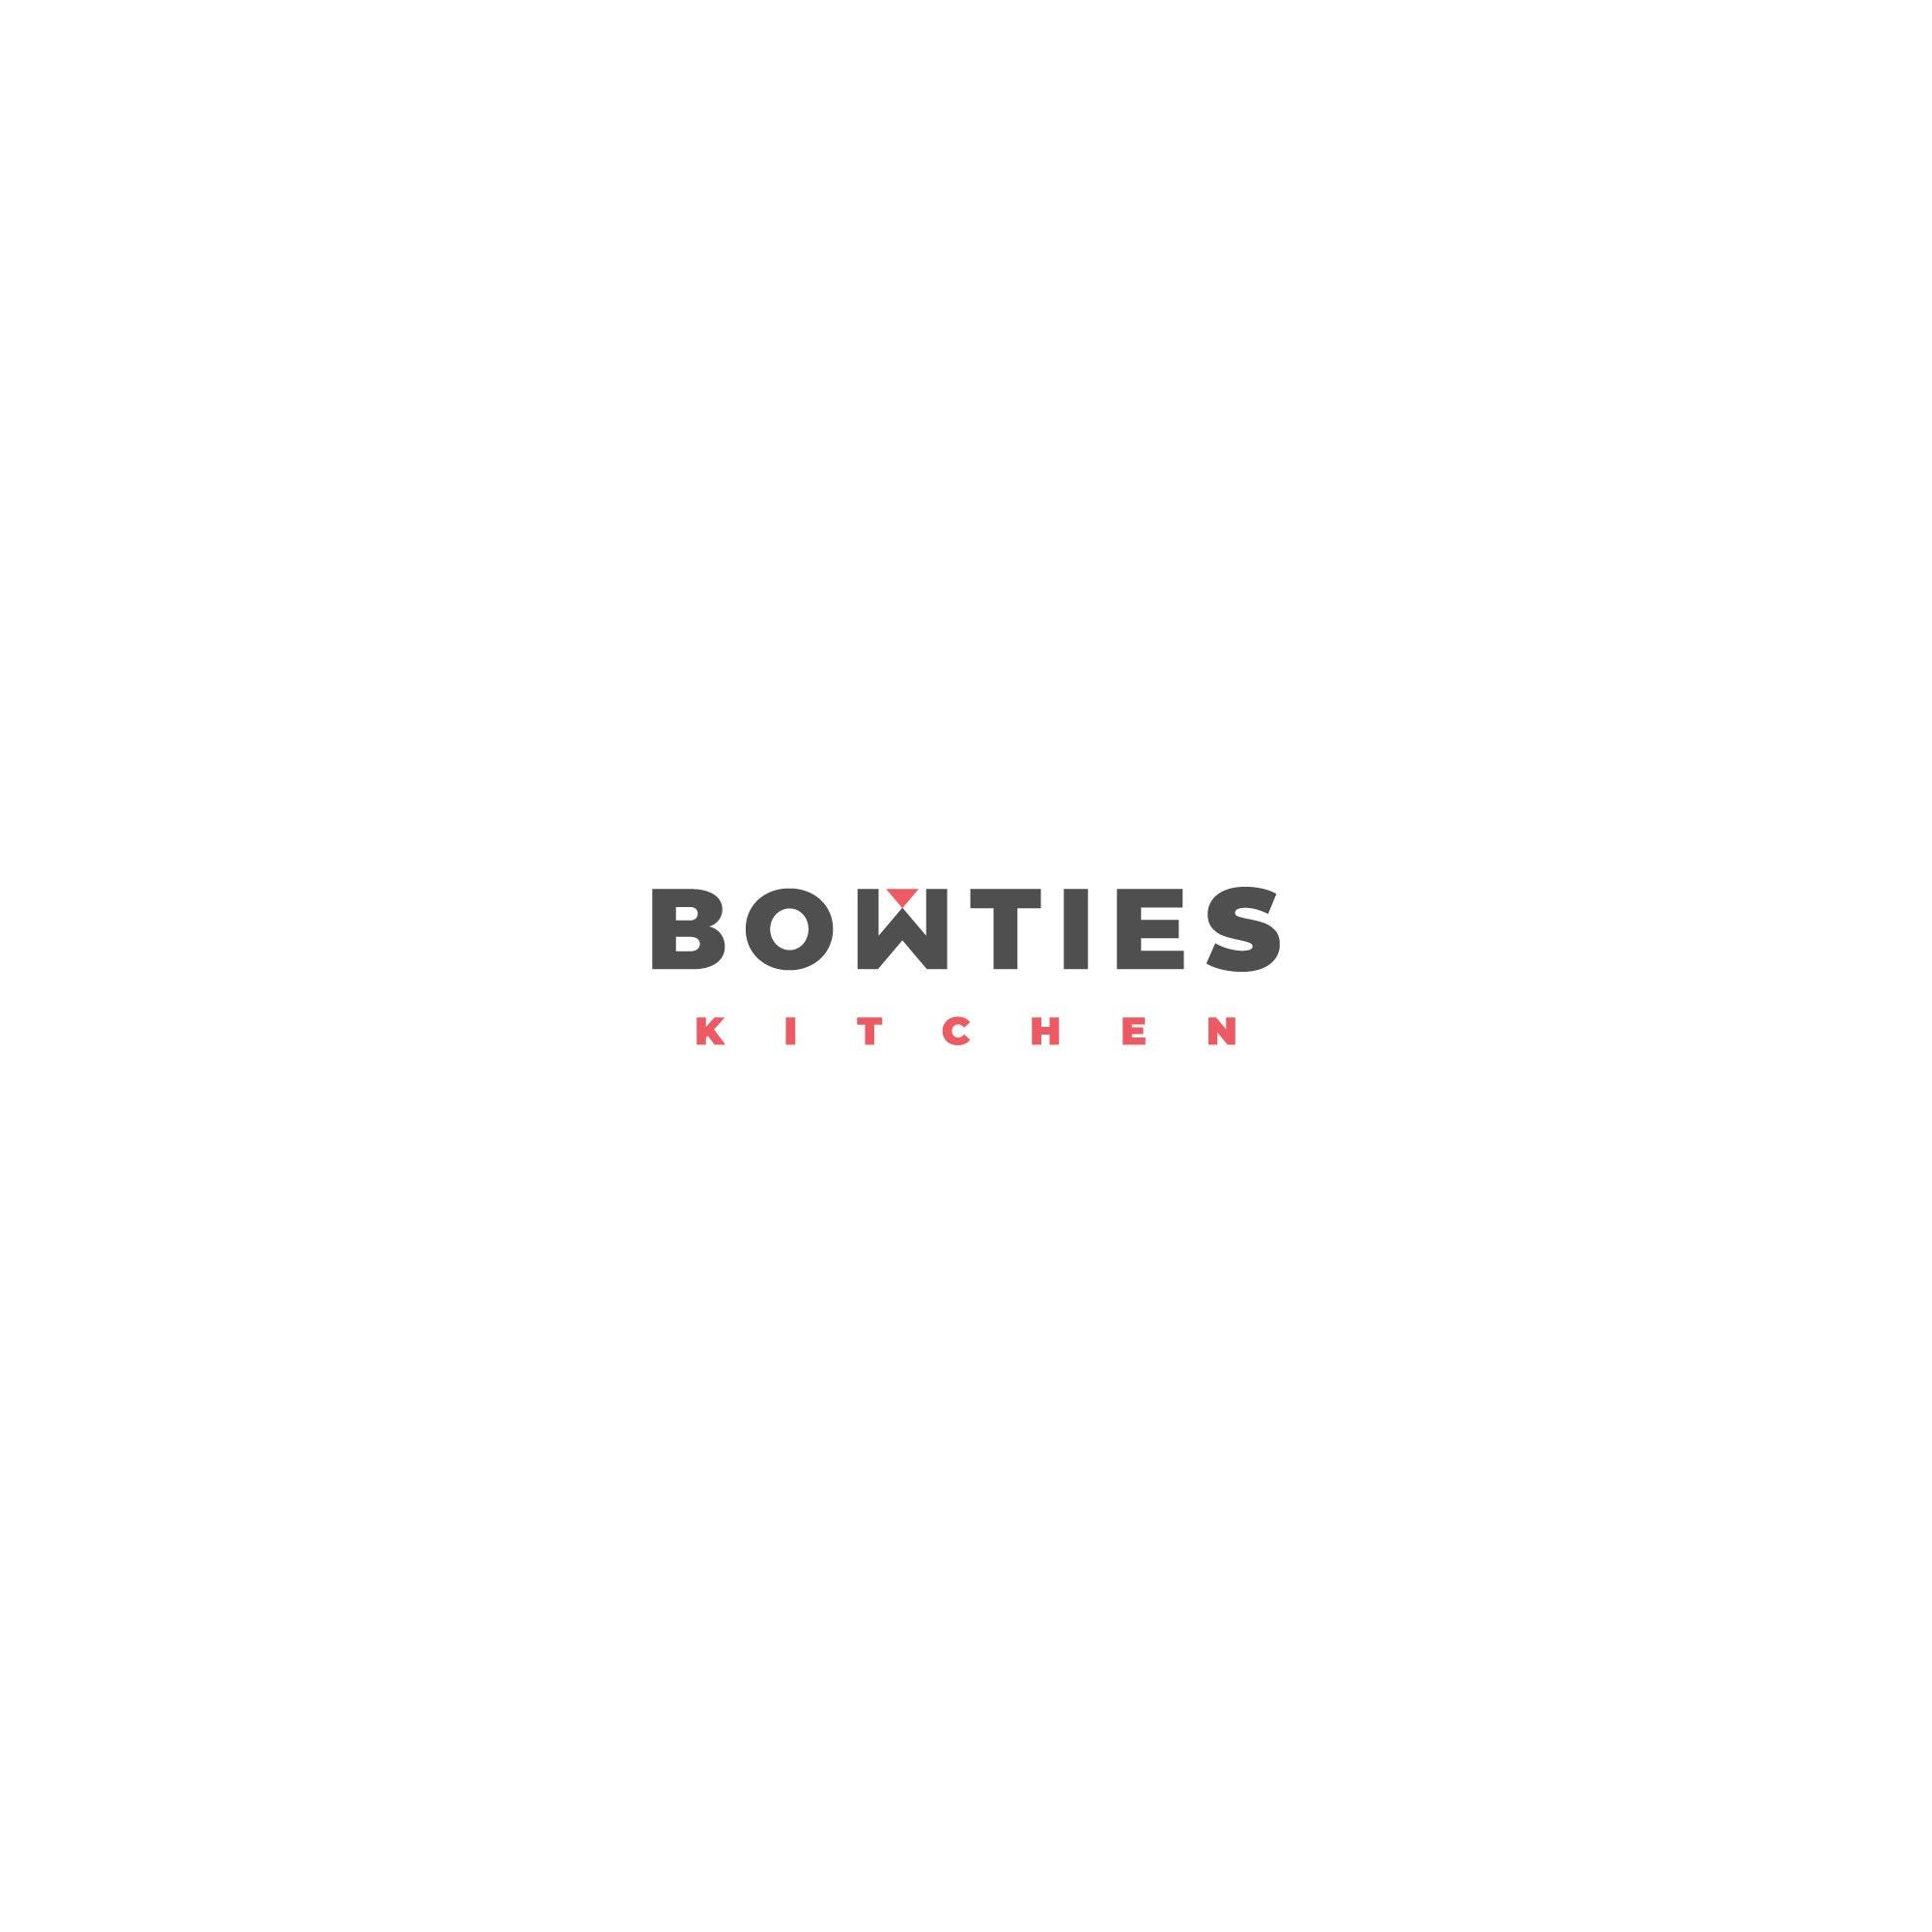 Bowties Kitchen logo